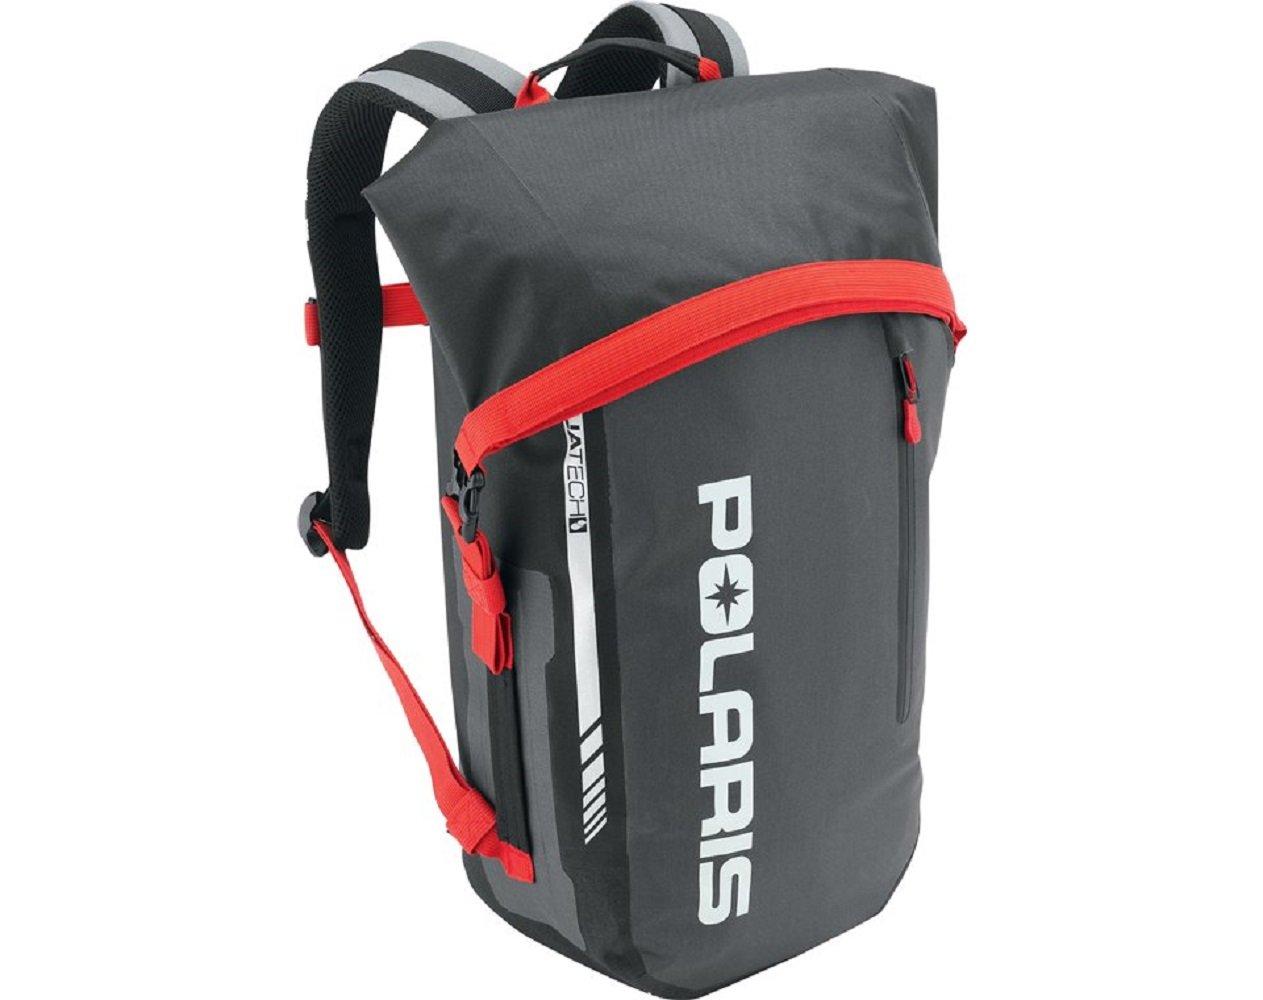 OEM Polaris Ogio Off Road Black & Red Waterproof Backpack Hiking, Trail Riding